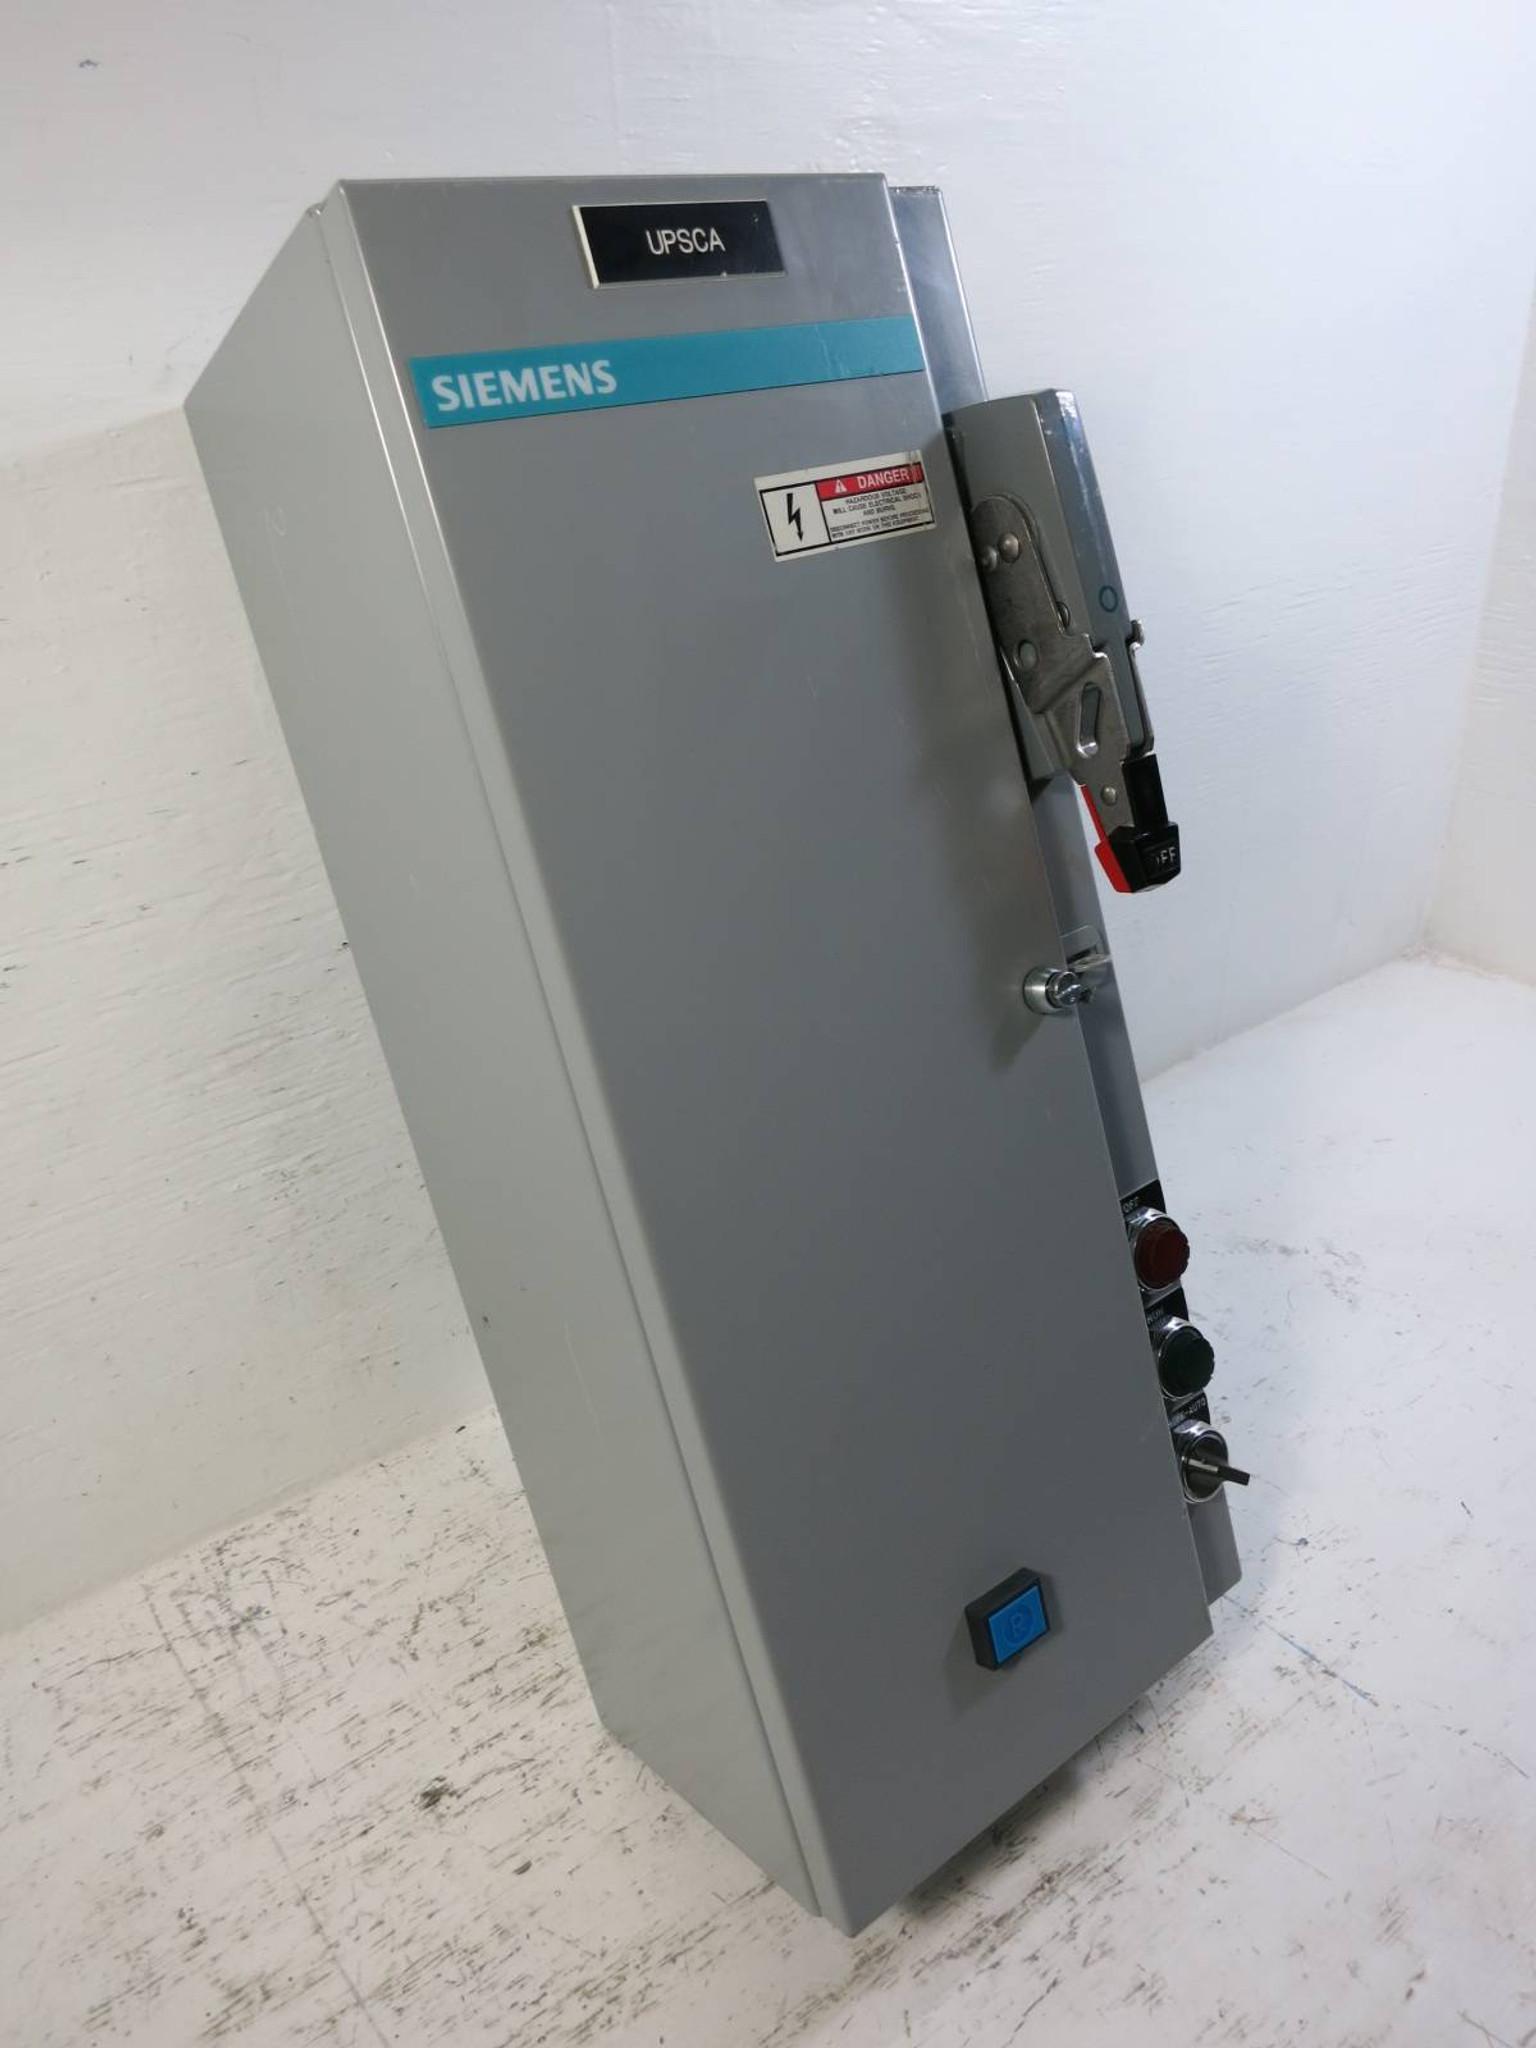 Siemens Starter SXL CO Size 1 27 Amp 208 Volt Coil